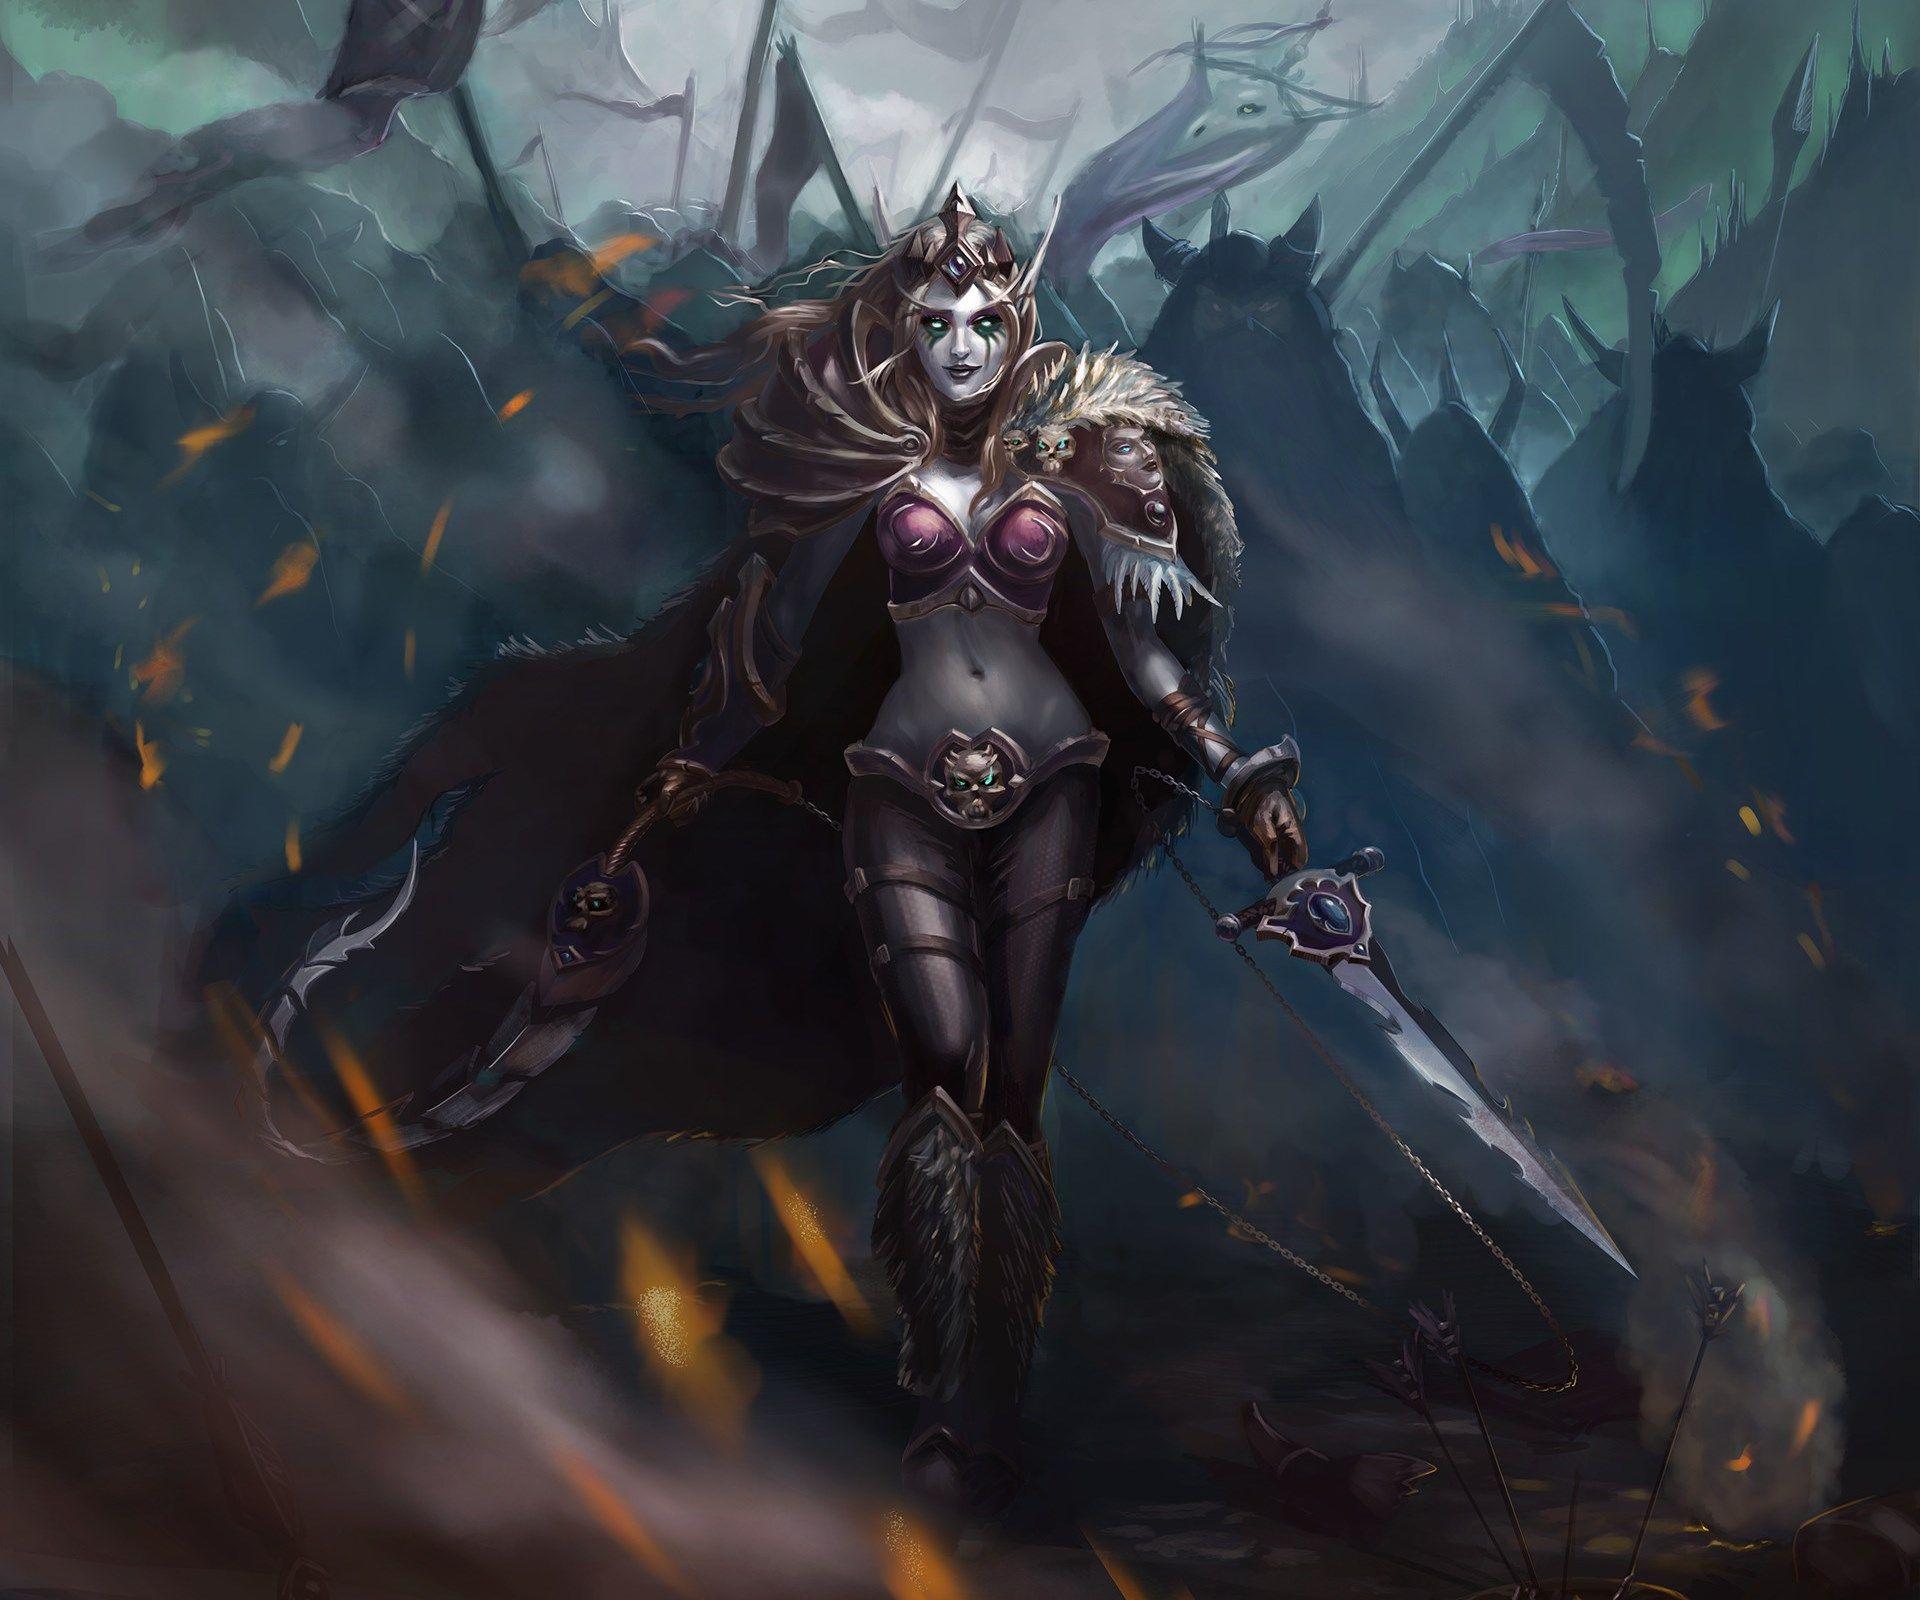 Free High Resolution Wallpaper World Of Warcraft World Of